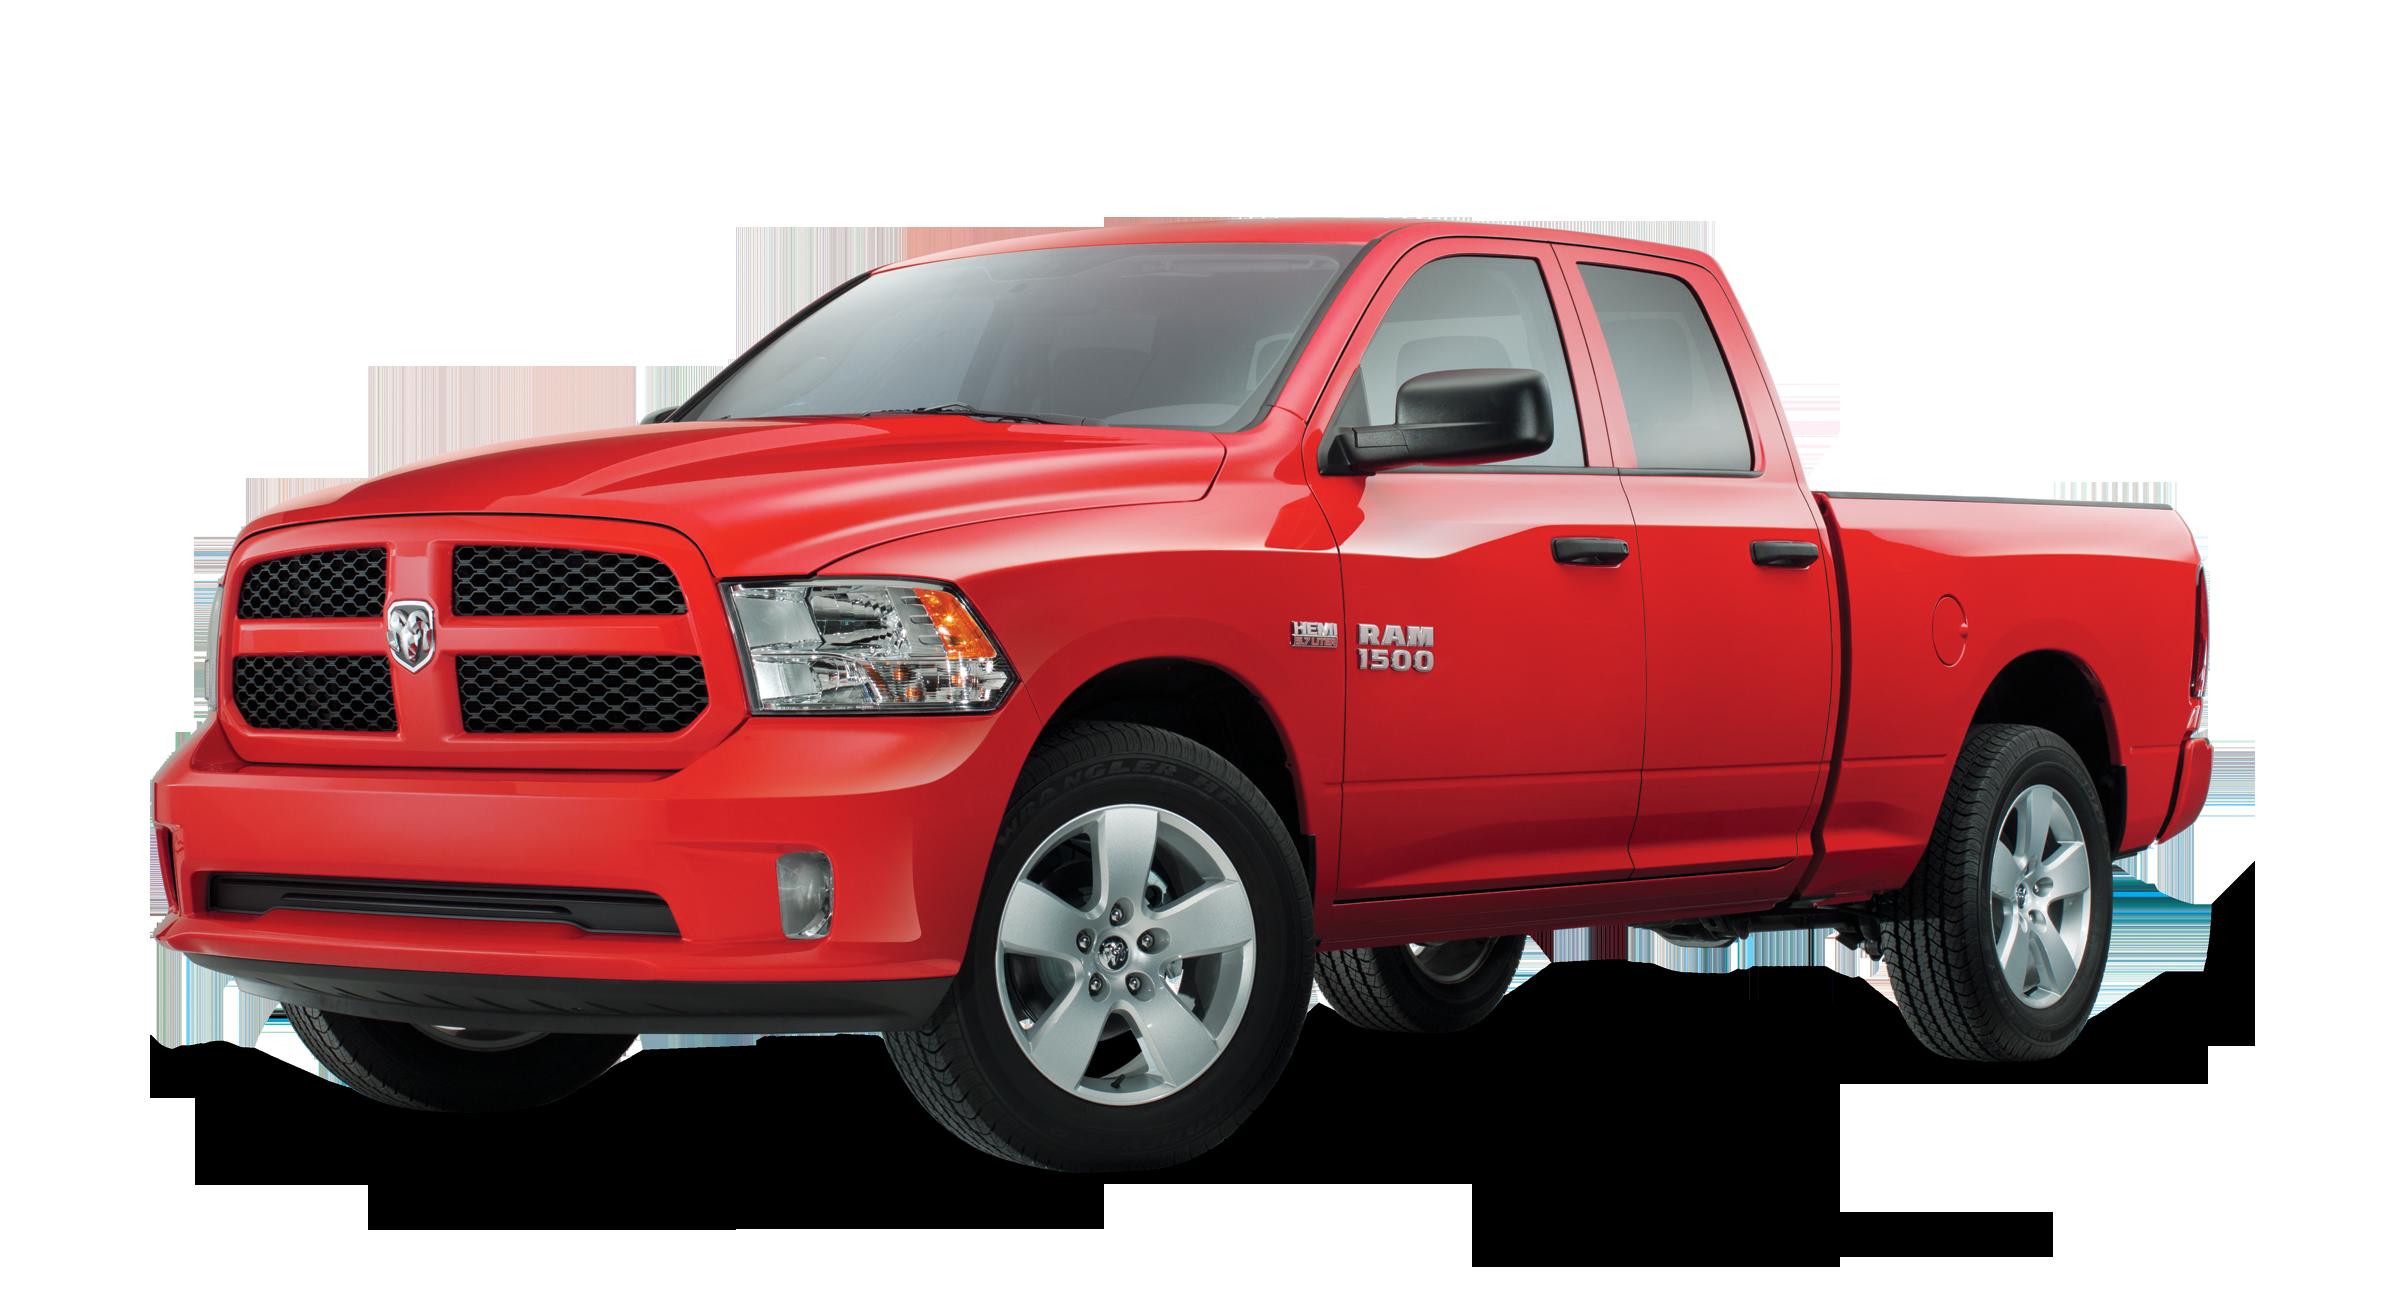 Pickup Truck Png Image Pickup Trucks Buy And Sell Cars Trucks